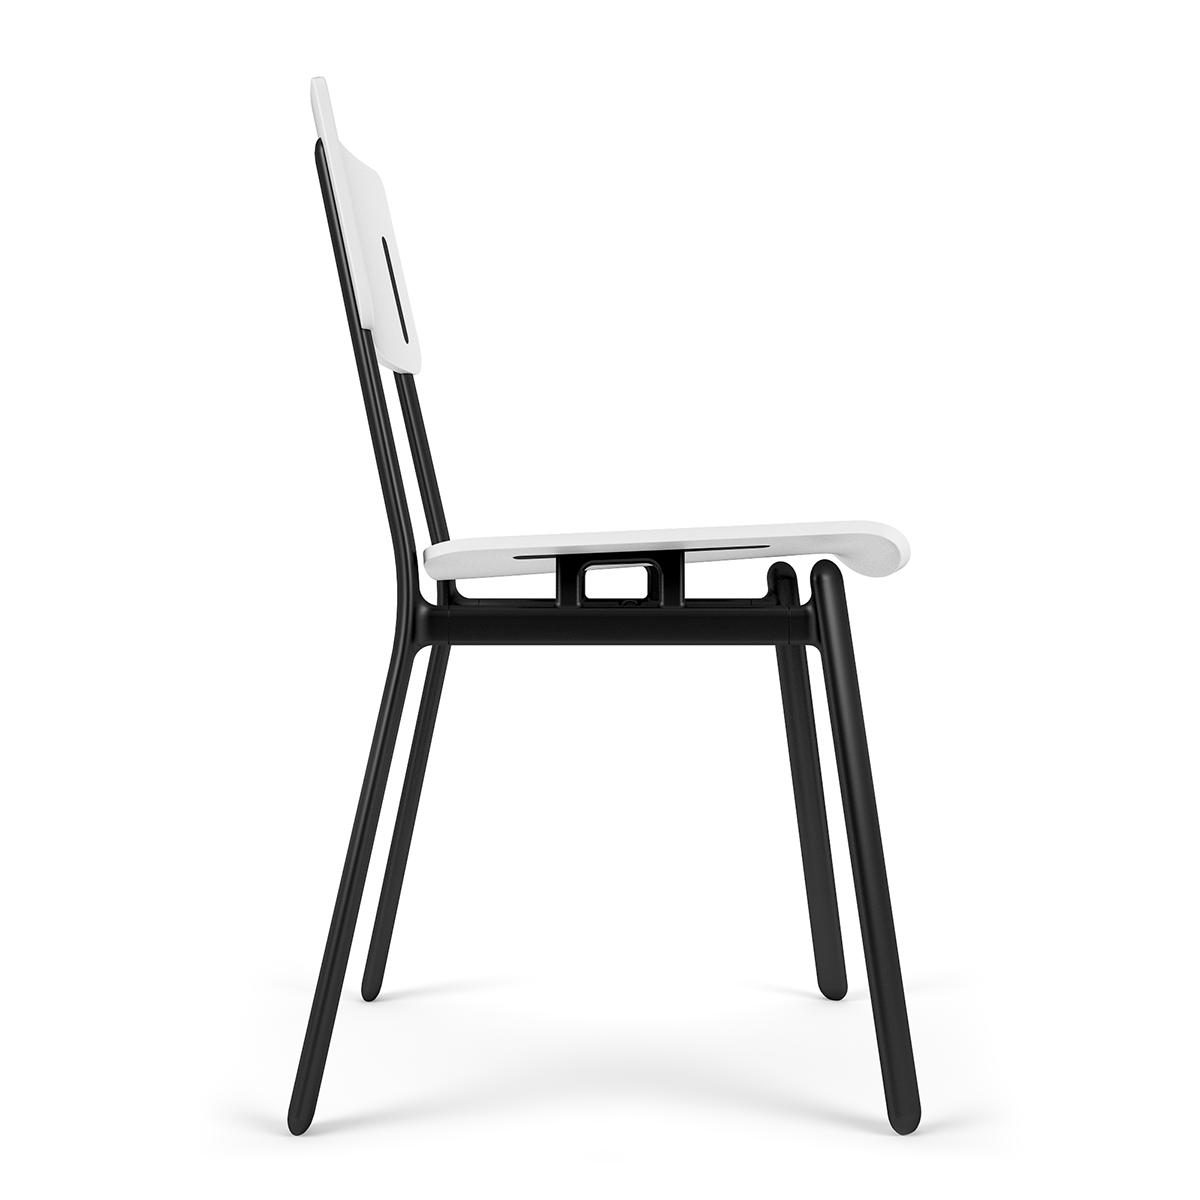 ALTONA塑料椅子概念设计